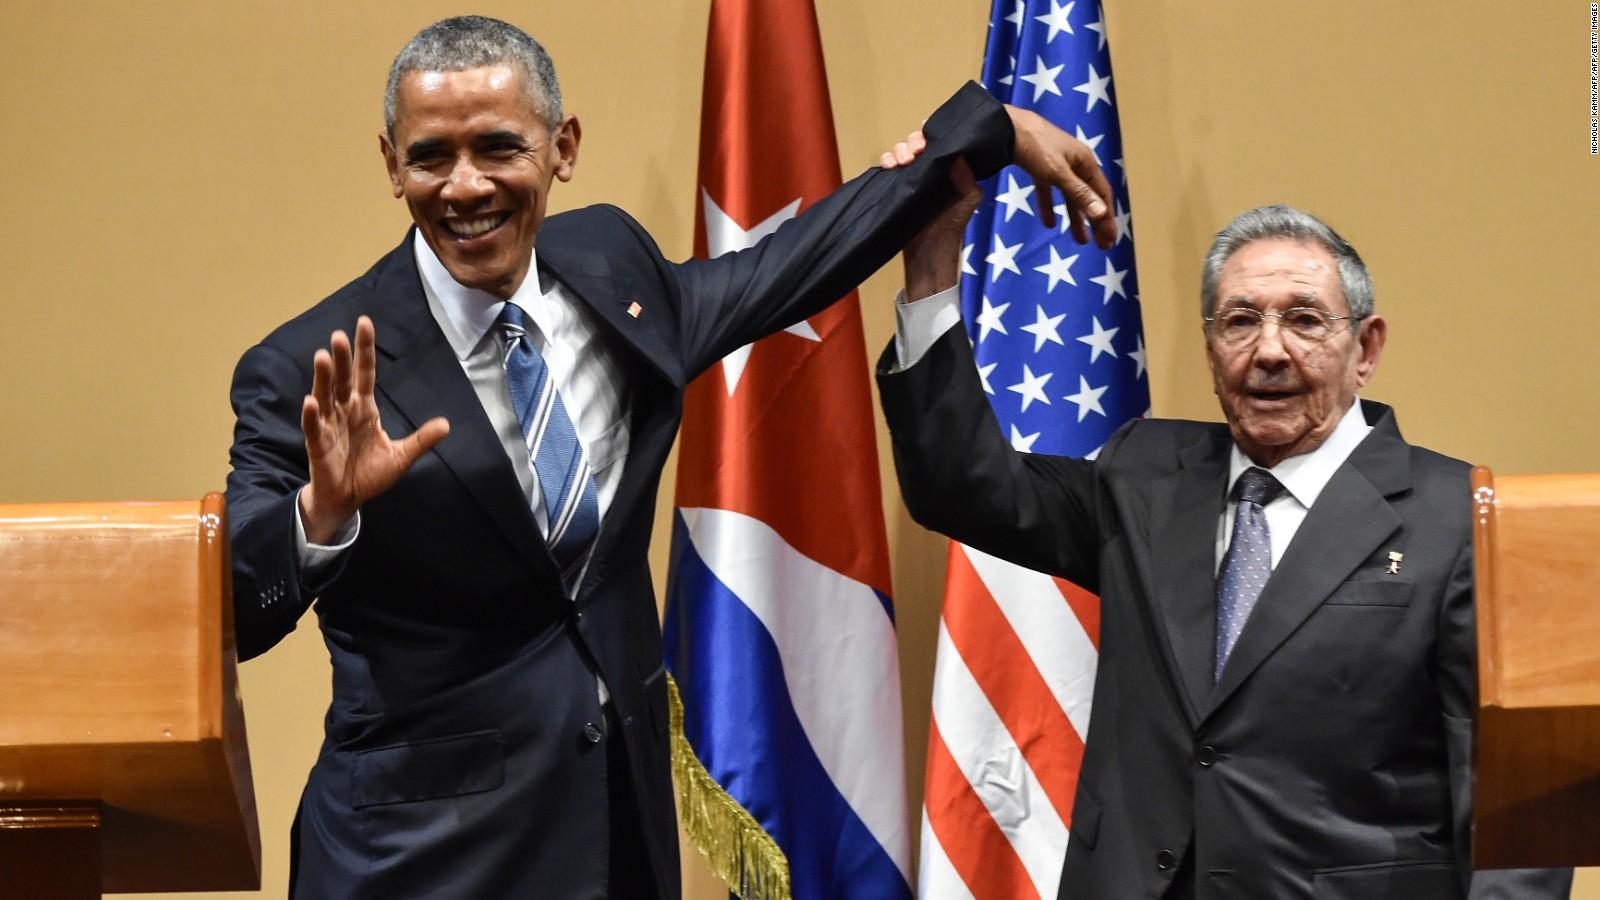 Image result for castro obama images